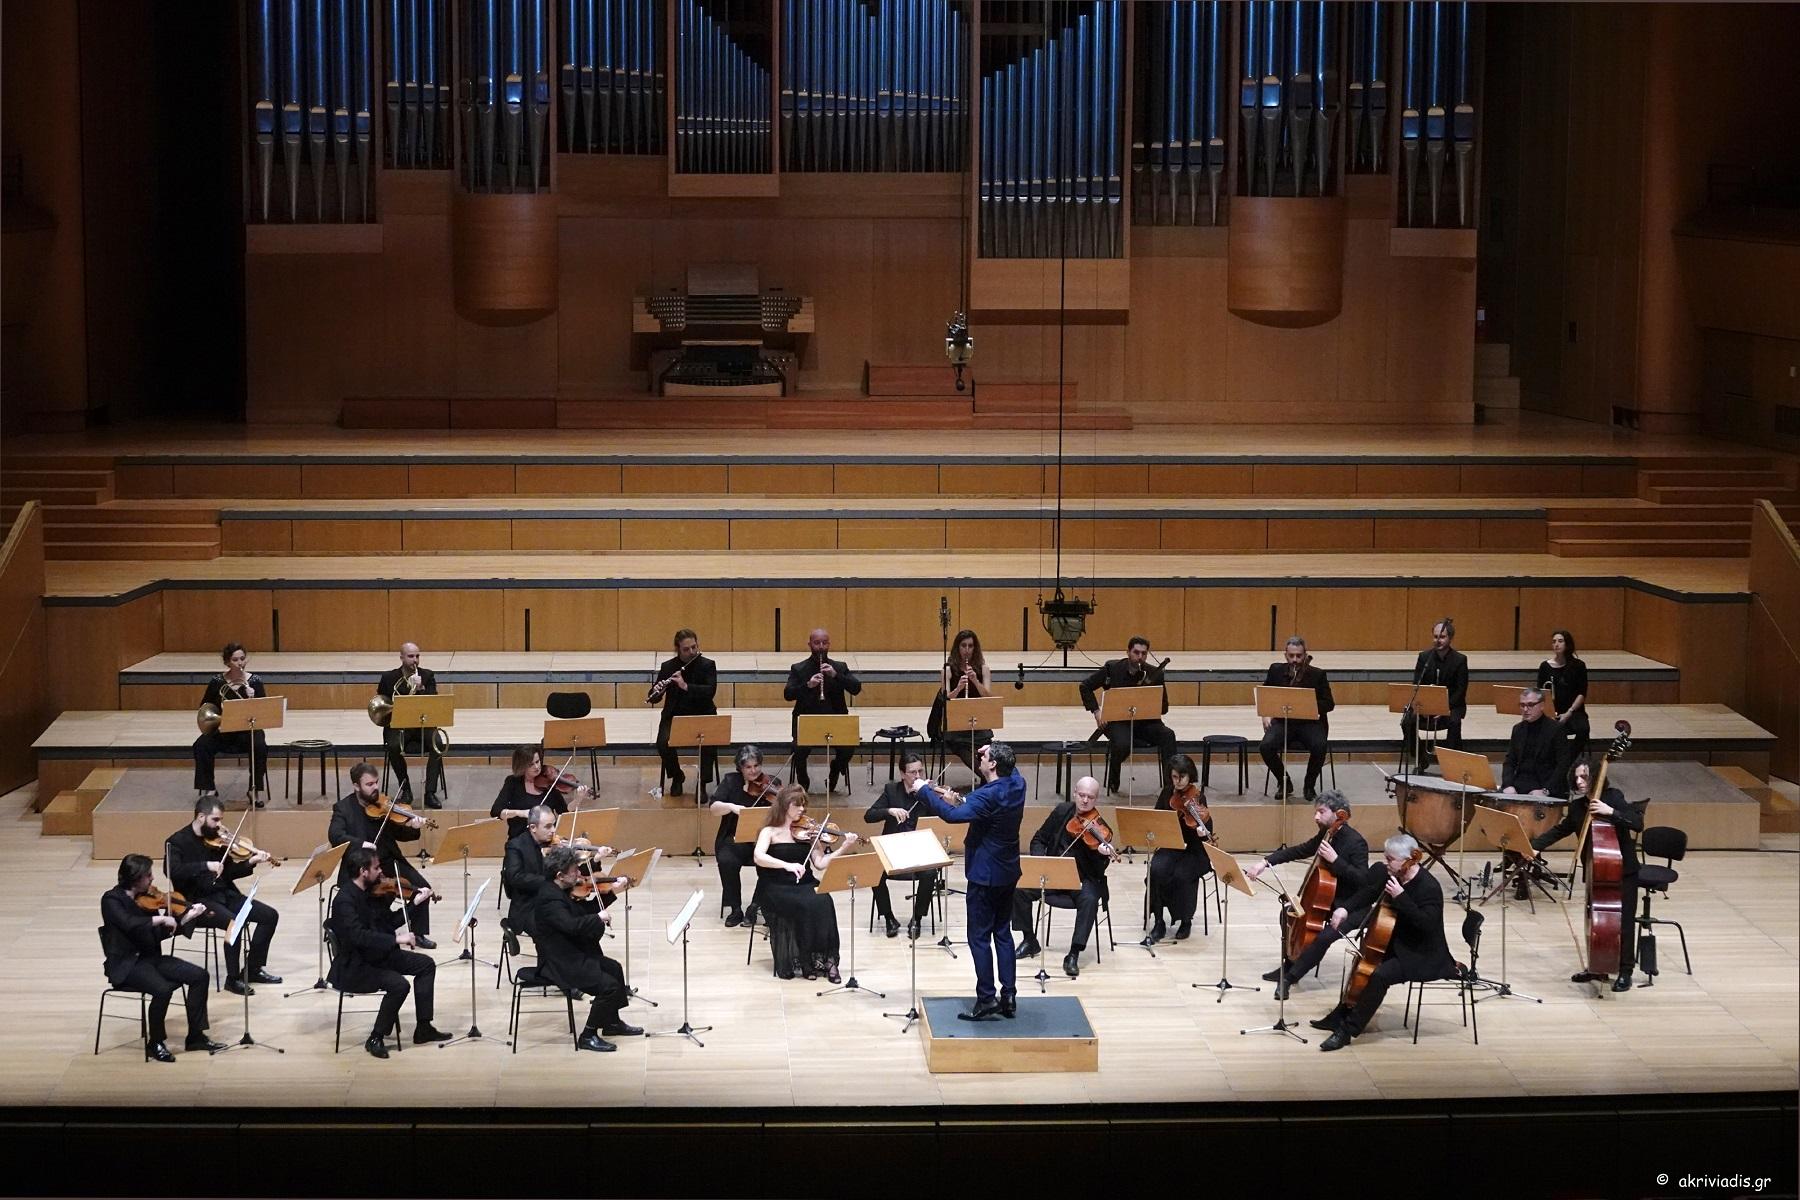 Oι Μουσικοί της Καμεράτας – Ορχήστρας των Φίλων της Μουσικής